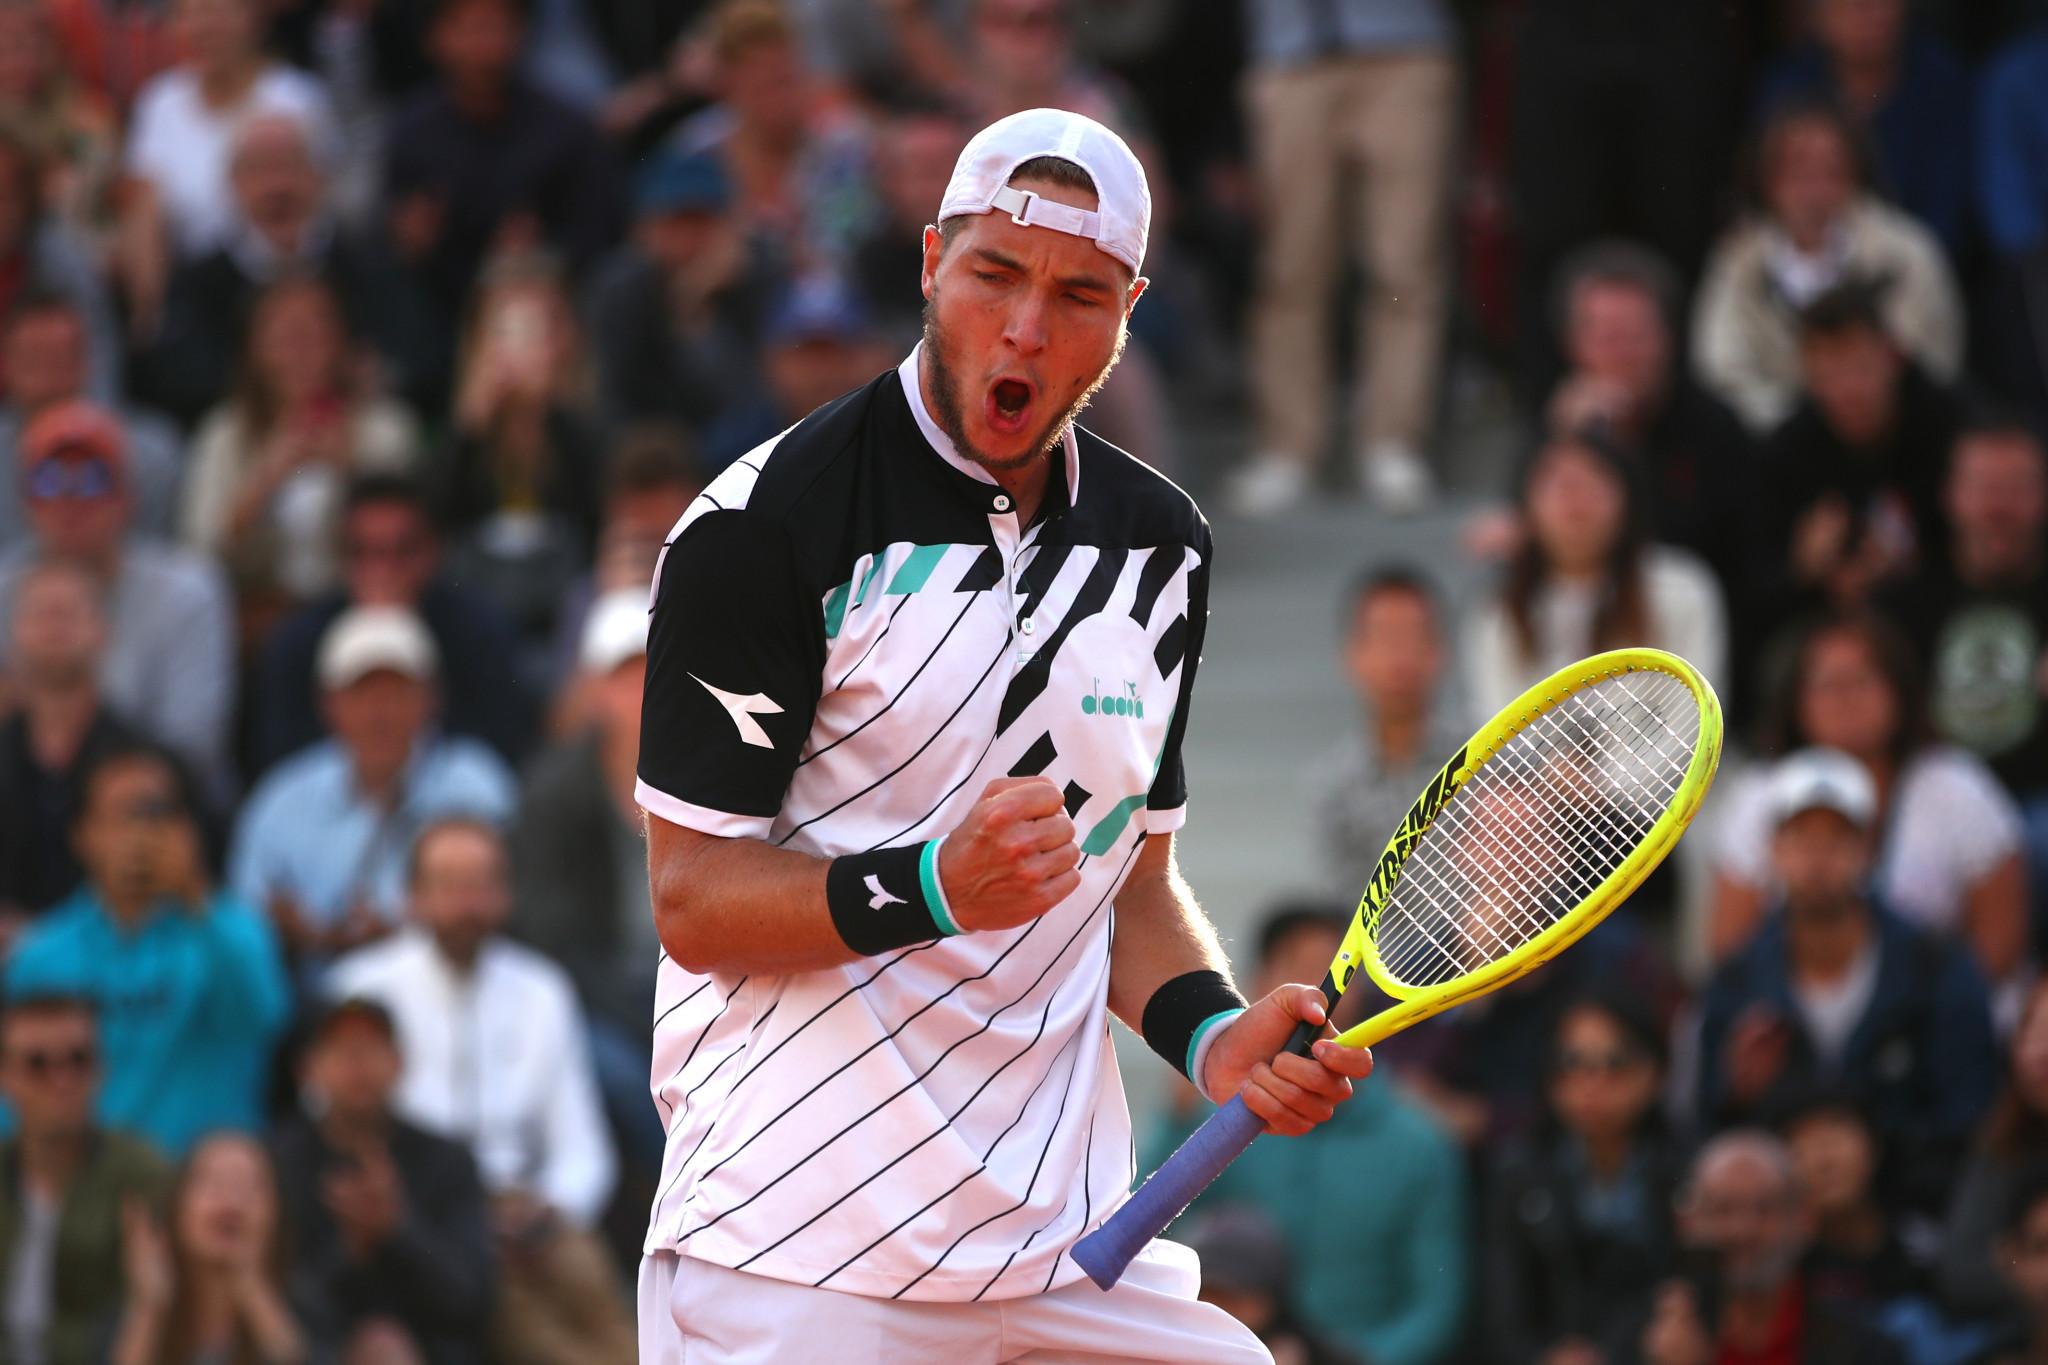 German tennis player Struff given permit to train during coronavirus crisis